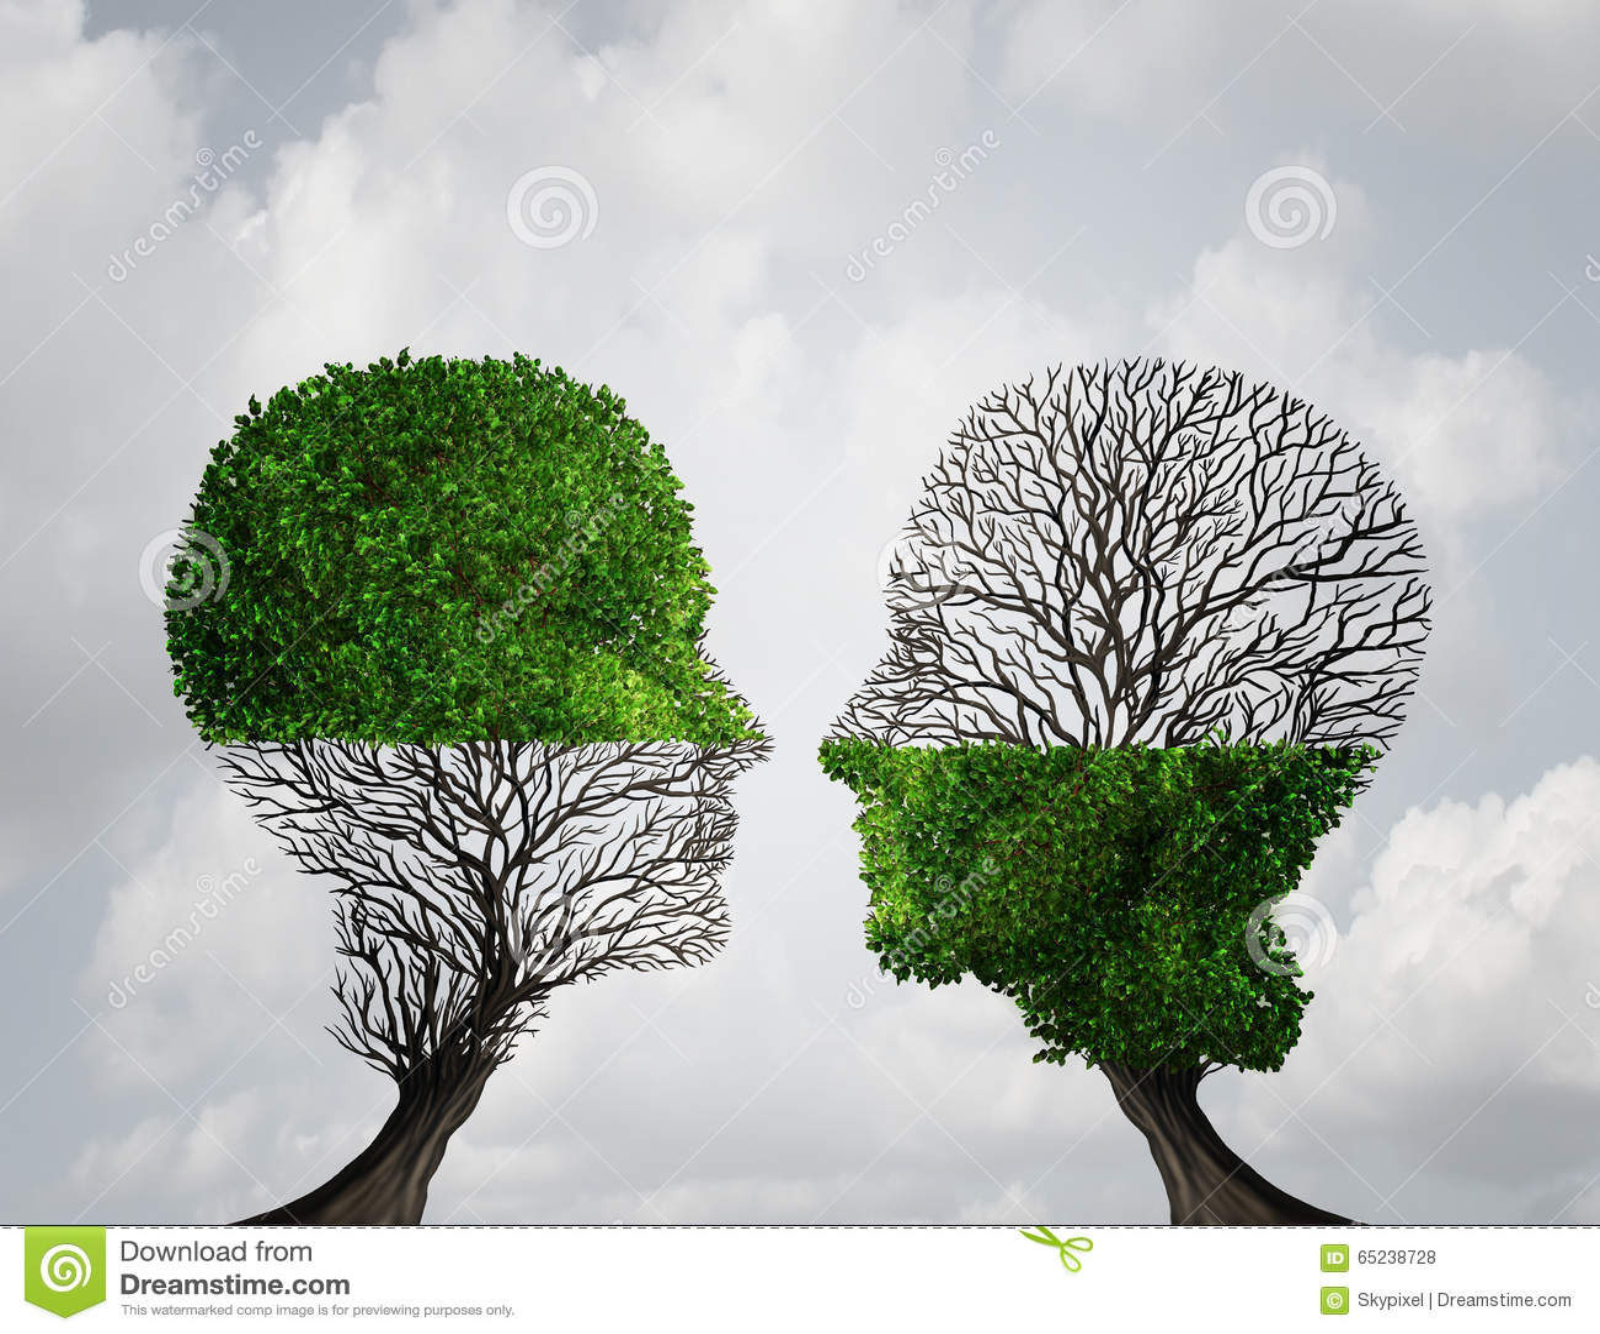 complement each other stock illustration  illustration of settlement